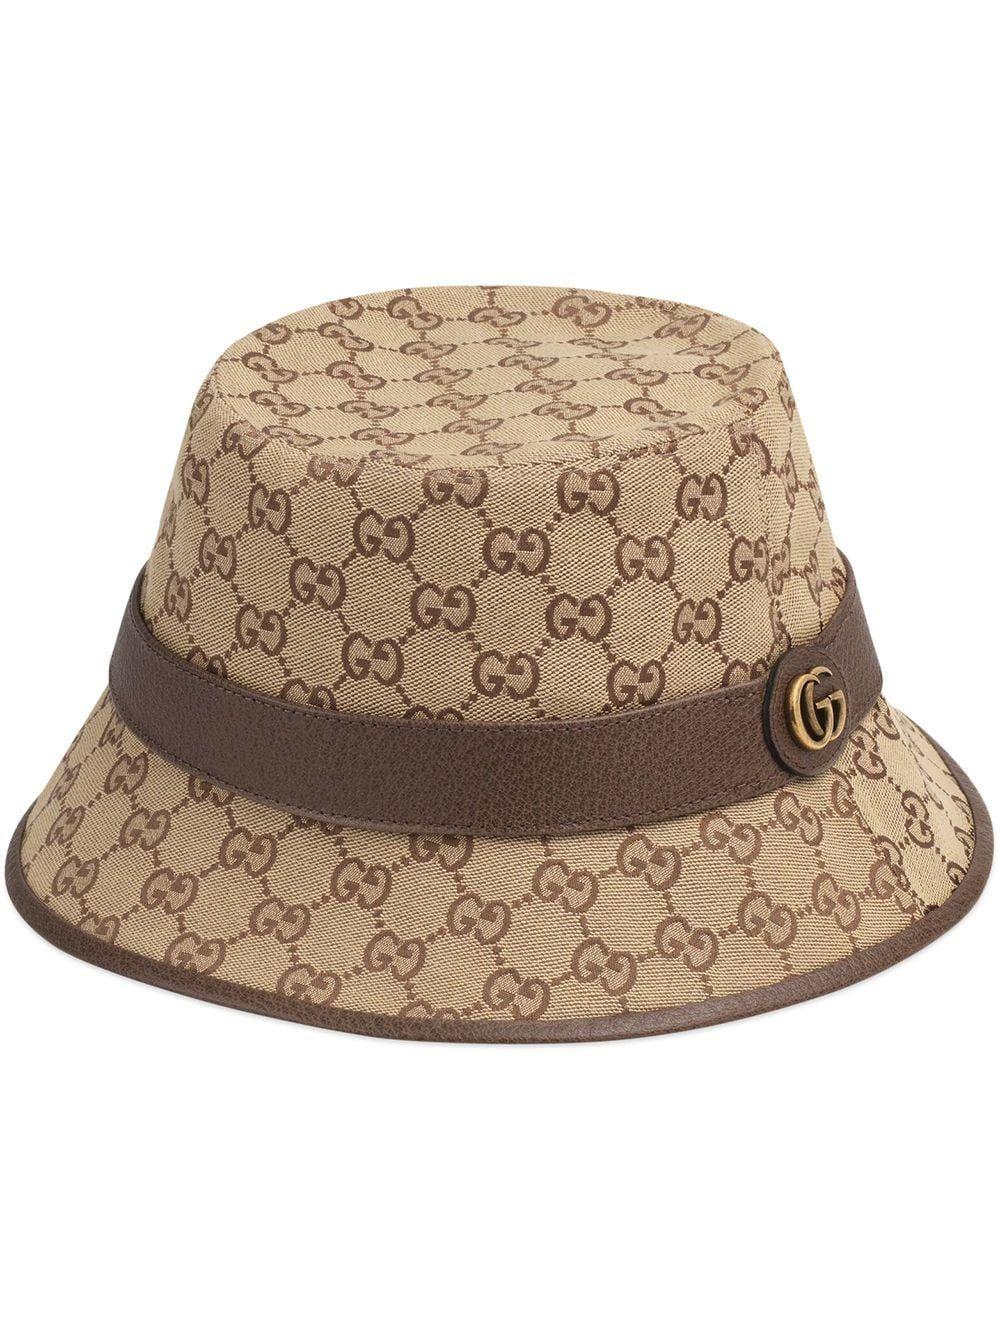 Cappello fedora in tessuto gg